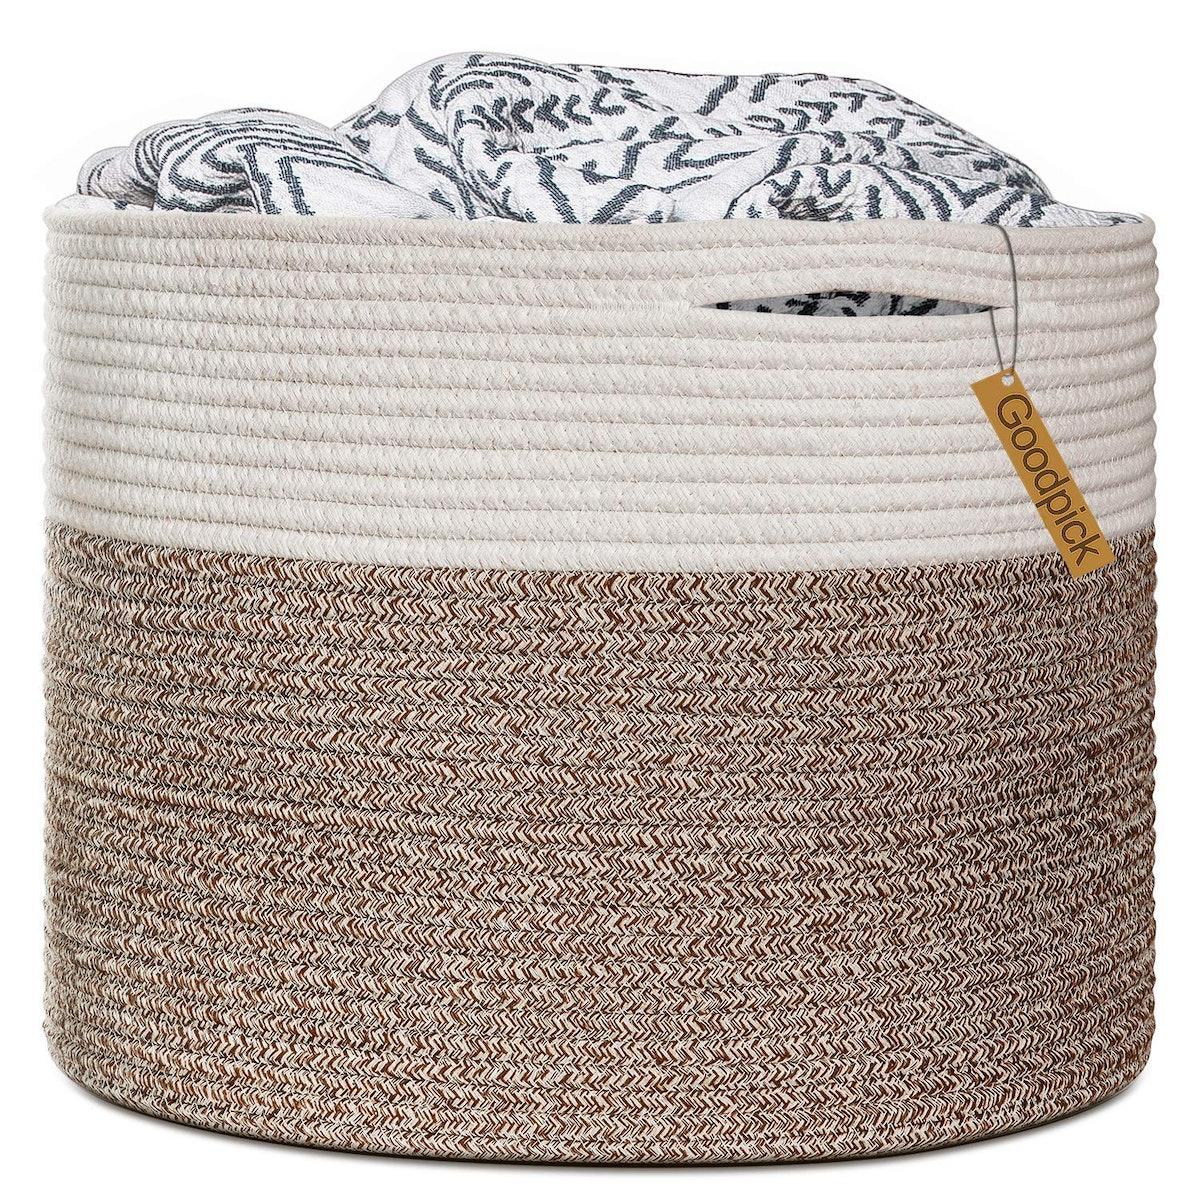 Goodpick Cotton Rope Laundry Basket